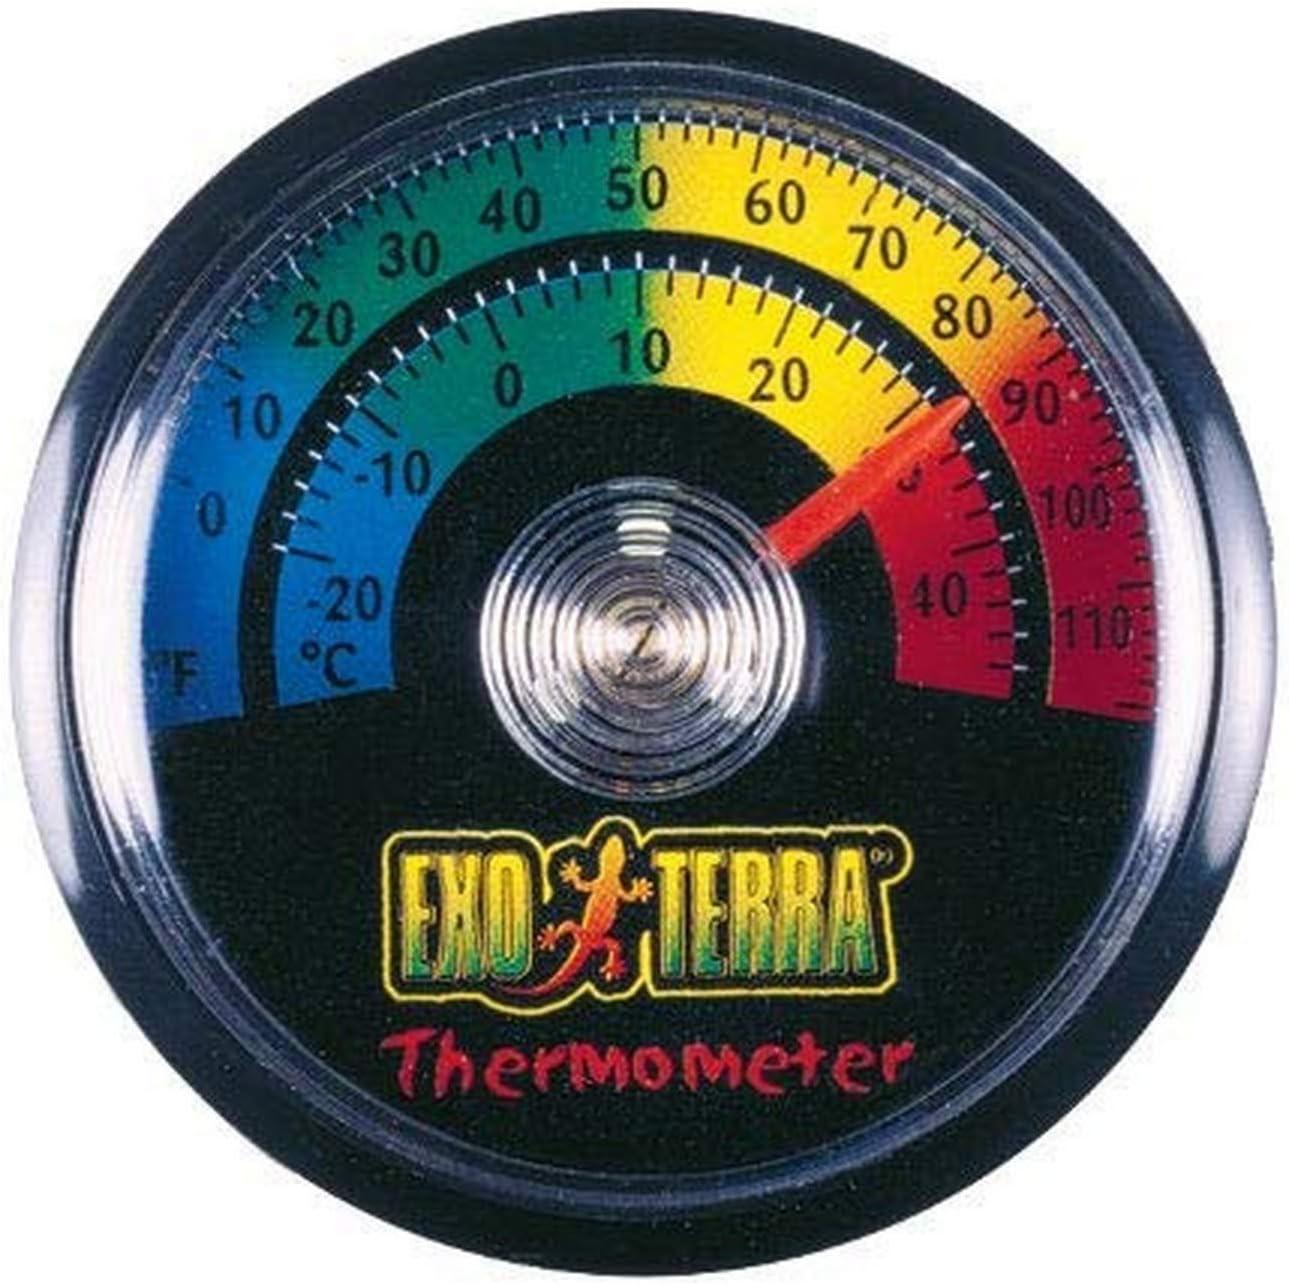 Exoterra ExoTerraTermómetroRedondo